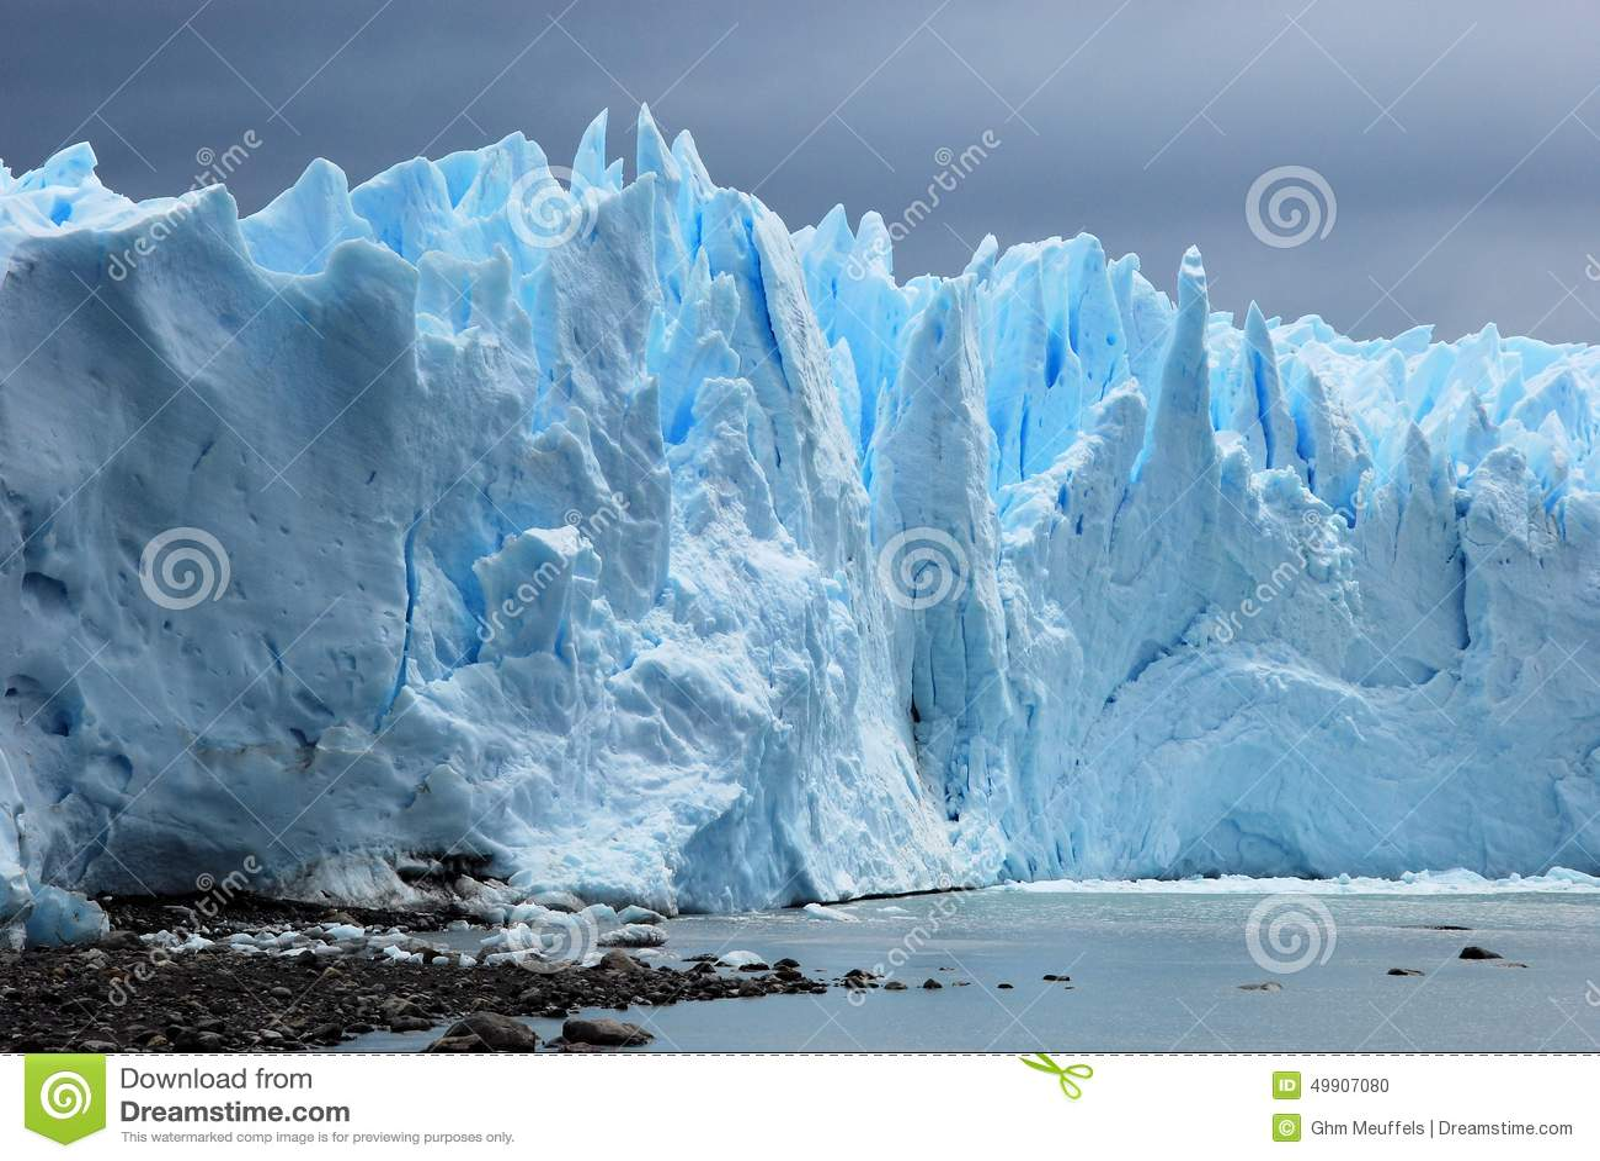 Ijzig die ijs Perito Moreno Glacier van Argentino Lake - Argentinië wordt gezien